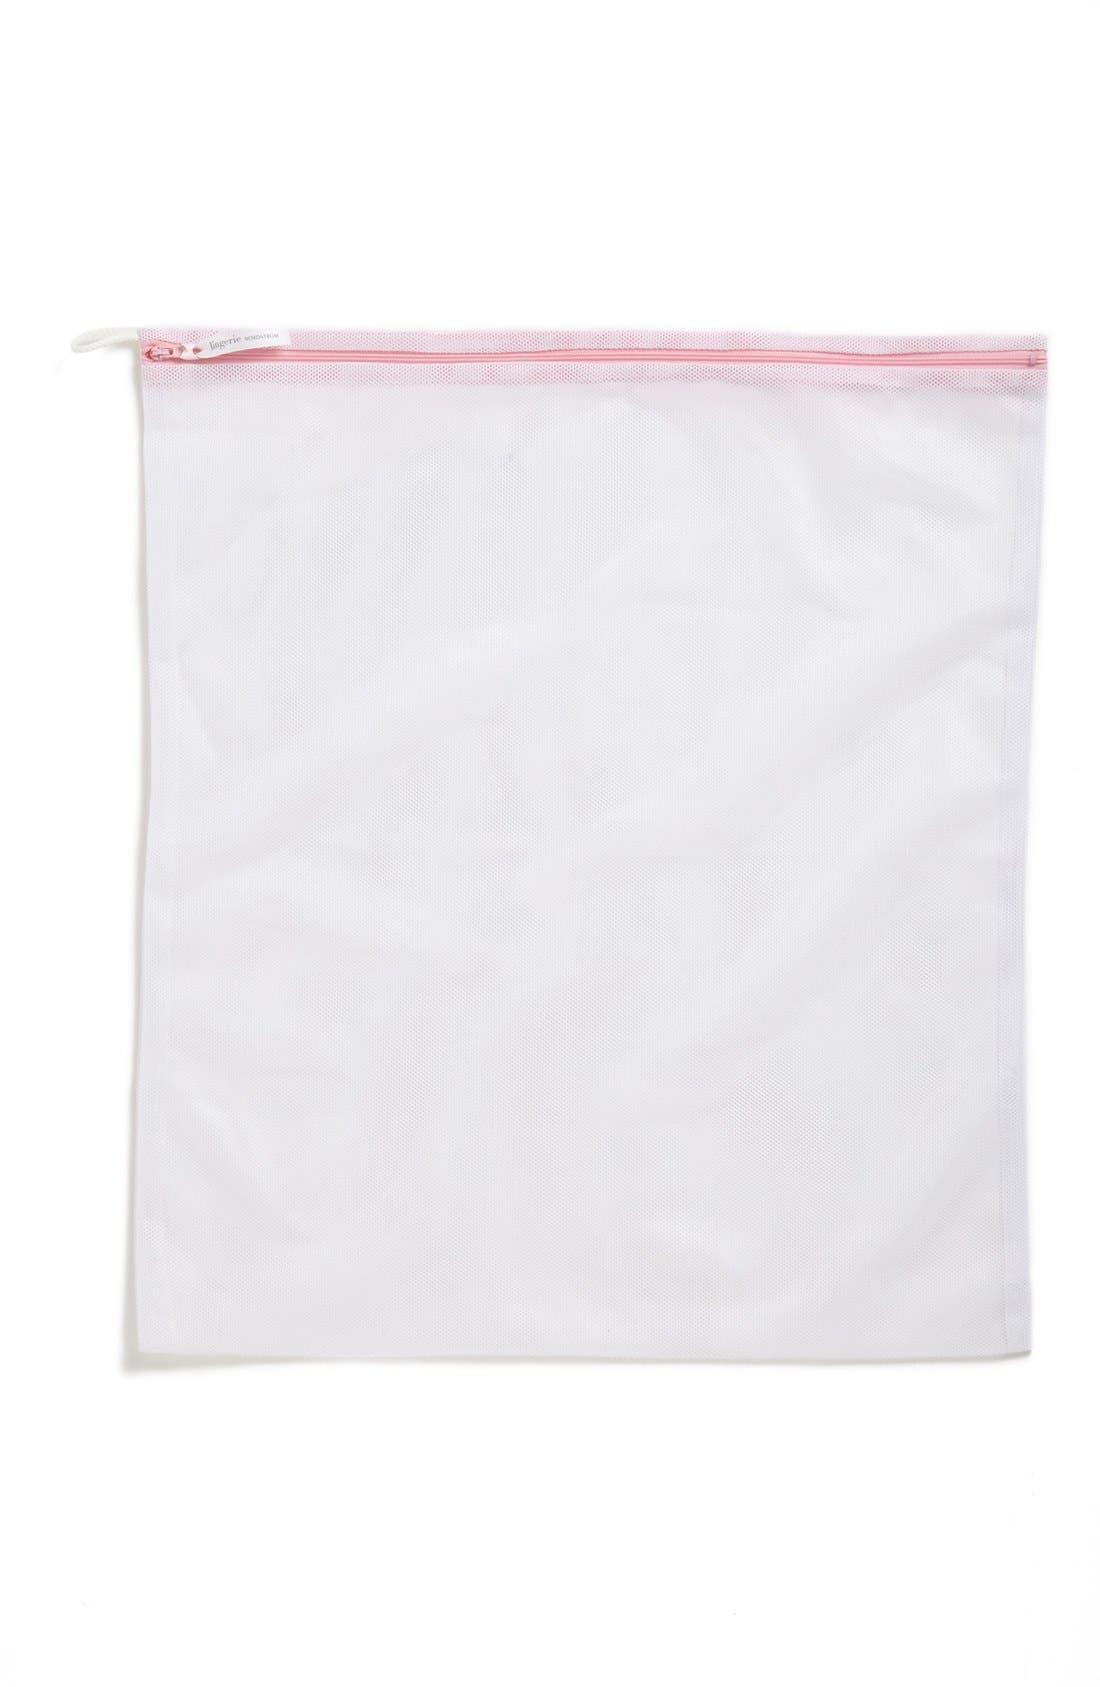 Large Lingerie Wash Bag,                             Alternate thumbnail 2, color,                             WHITE